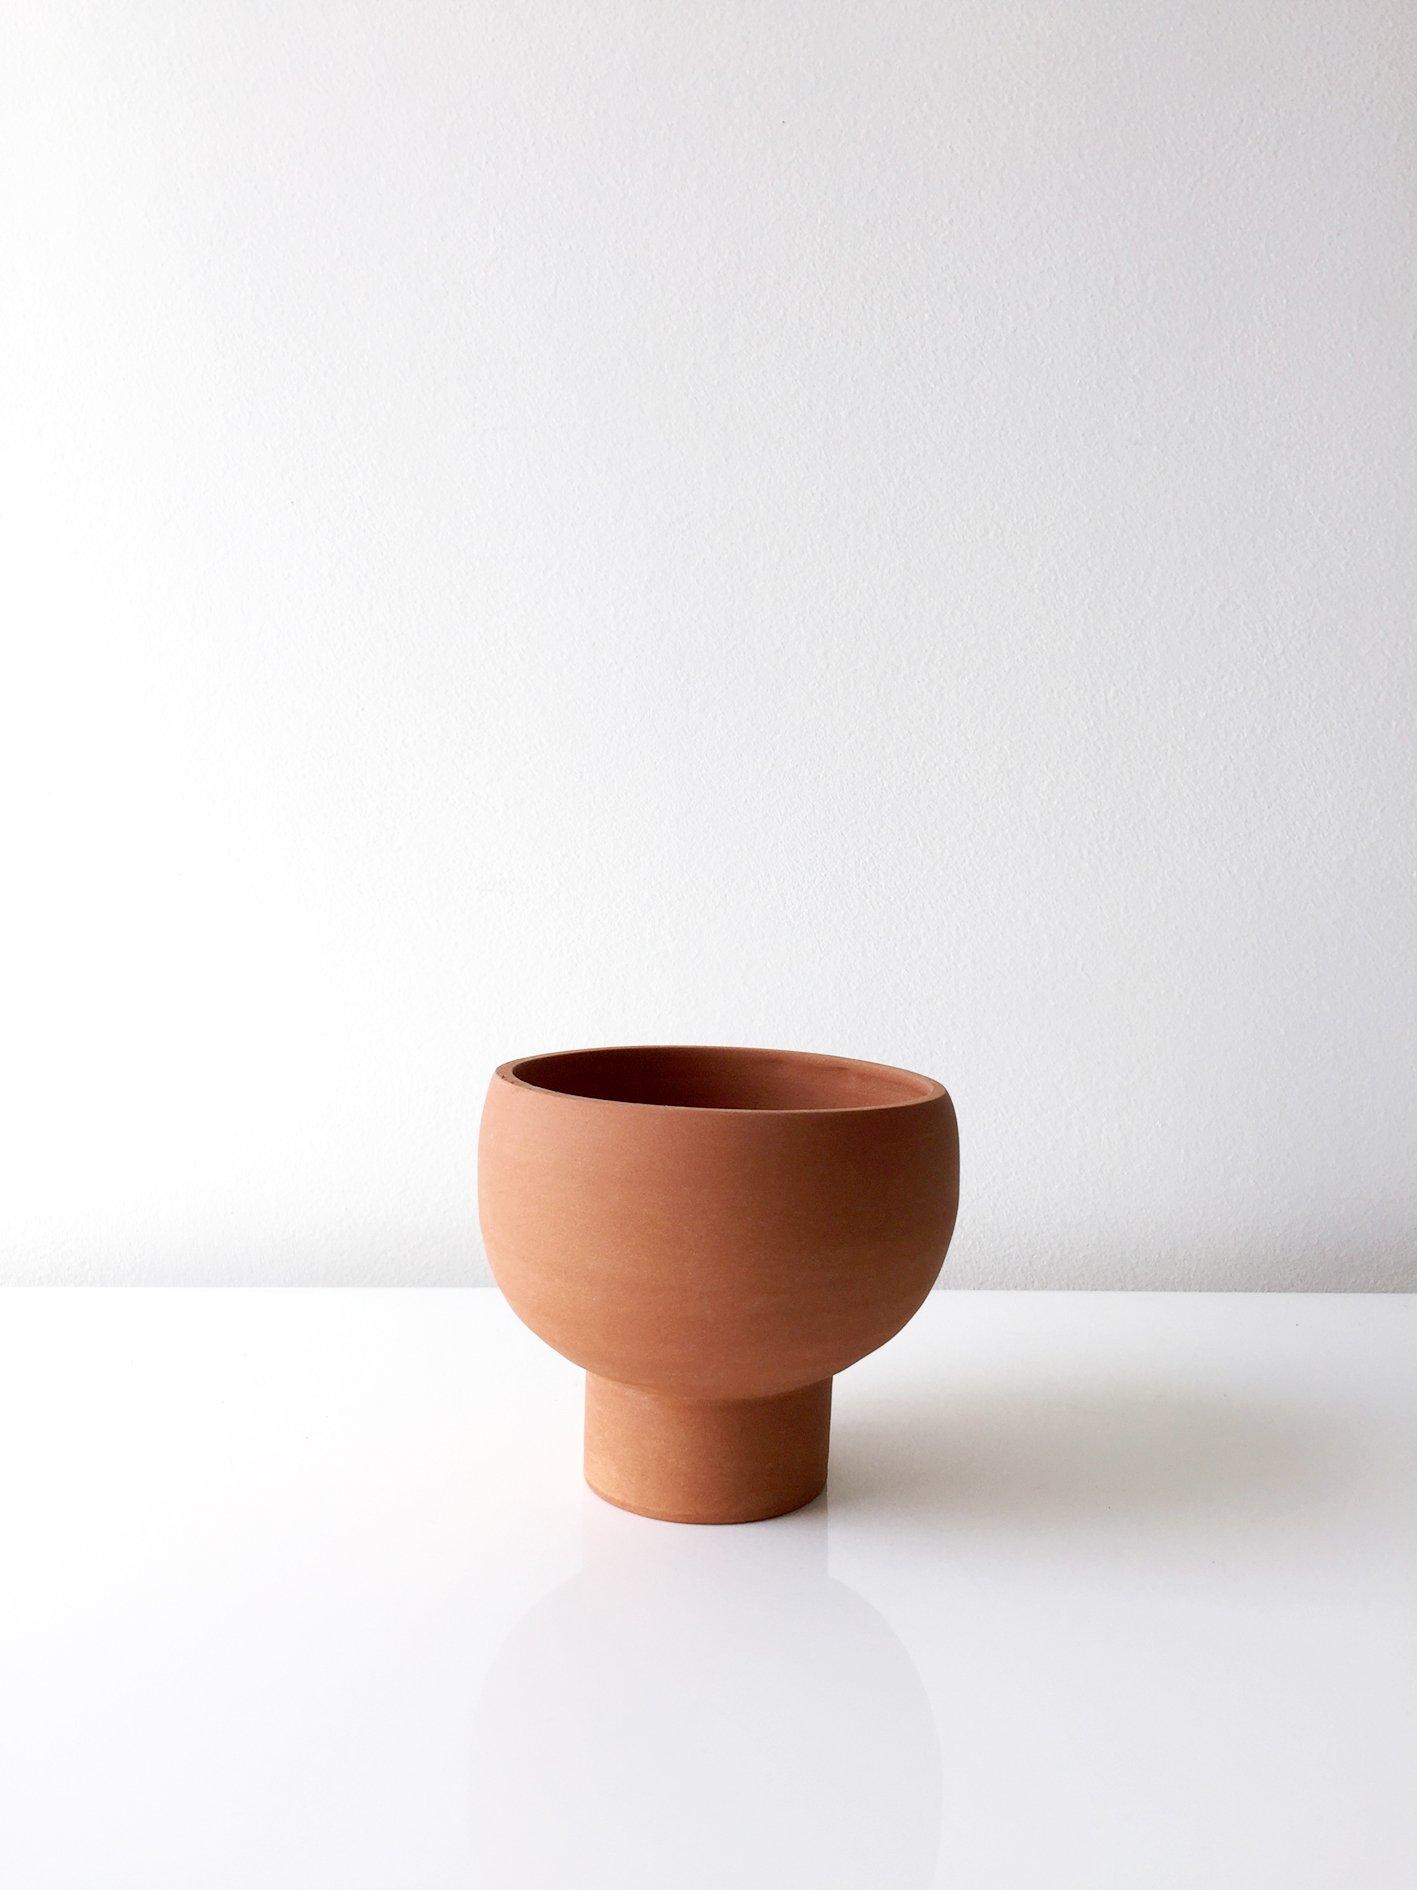 Image of Terracotta round planter